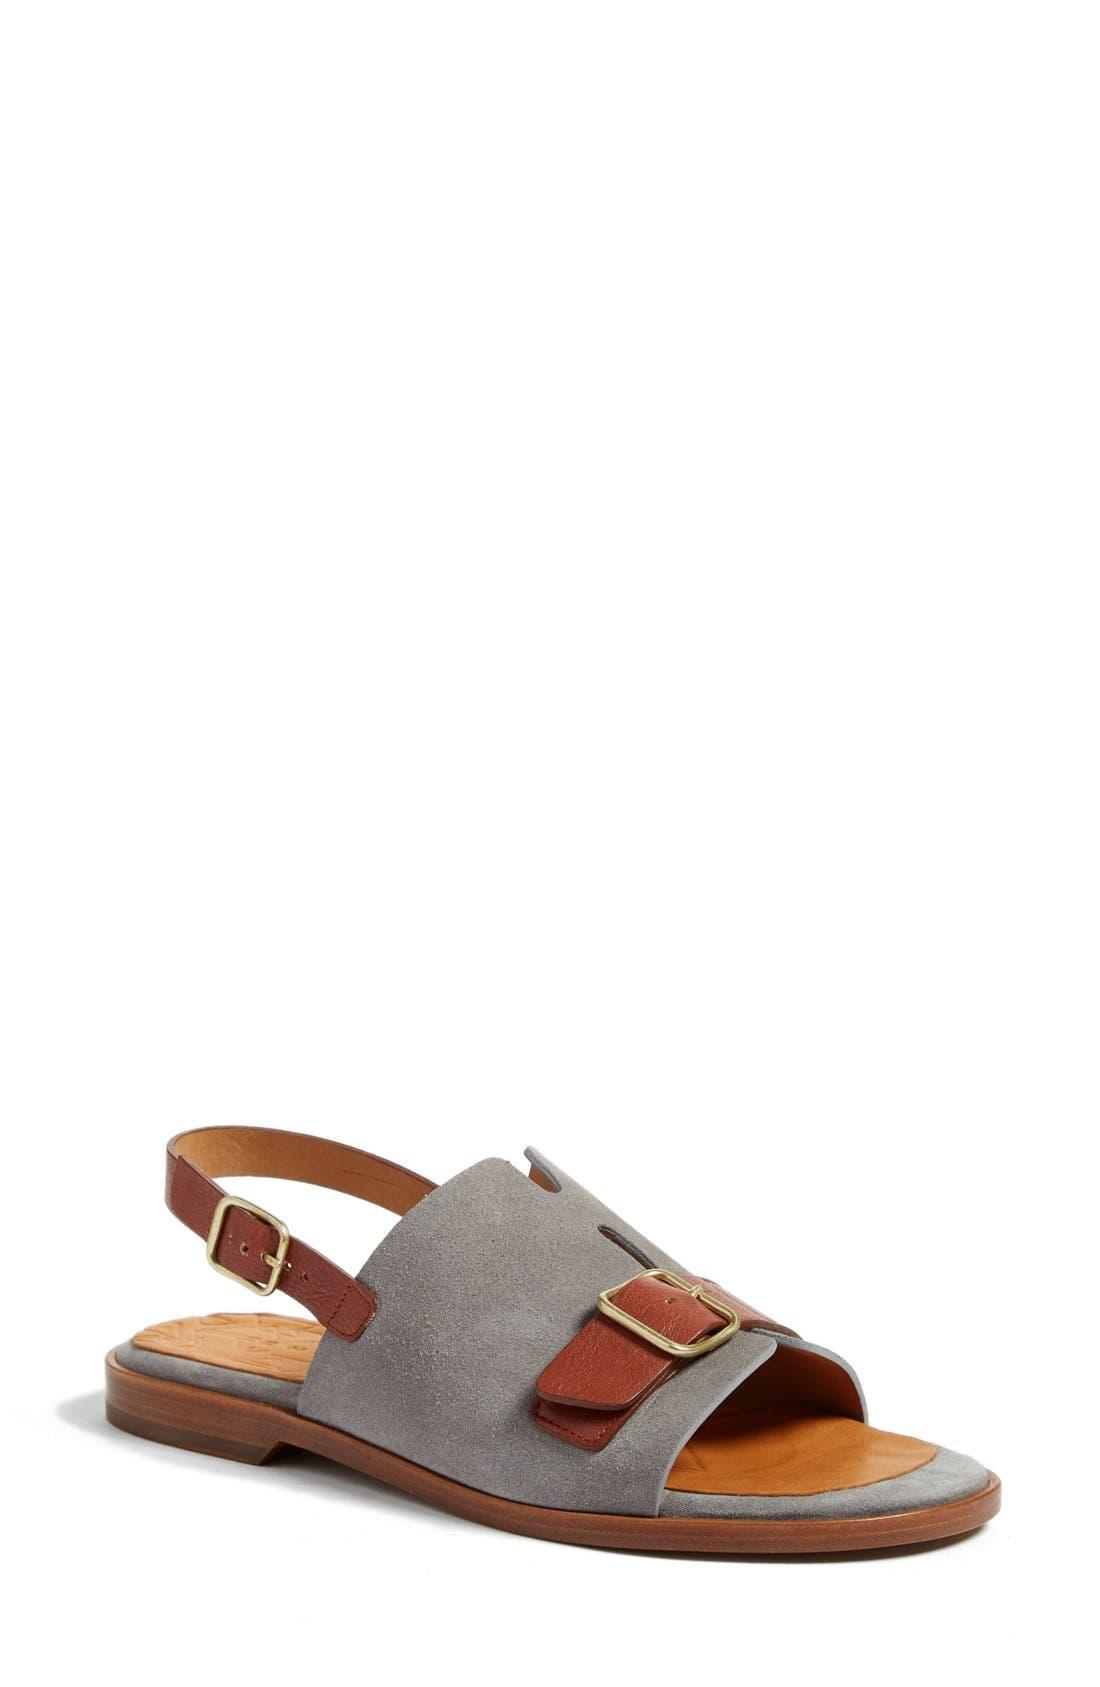 CHIE MIHARA Querete Slingback Sandal